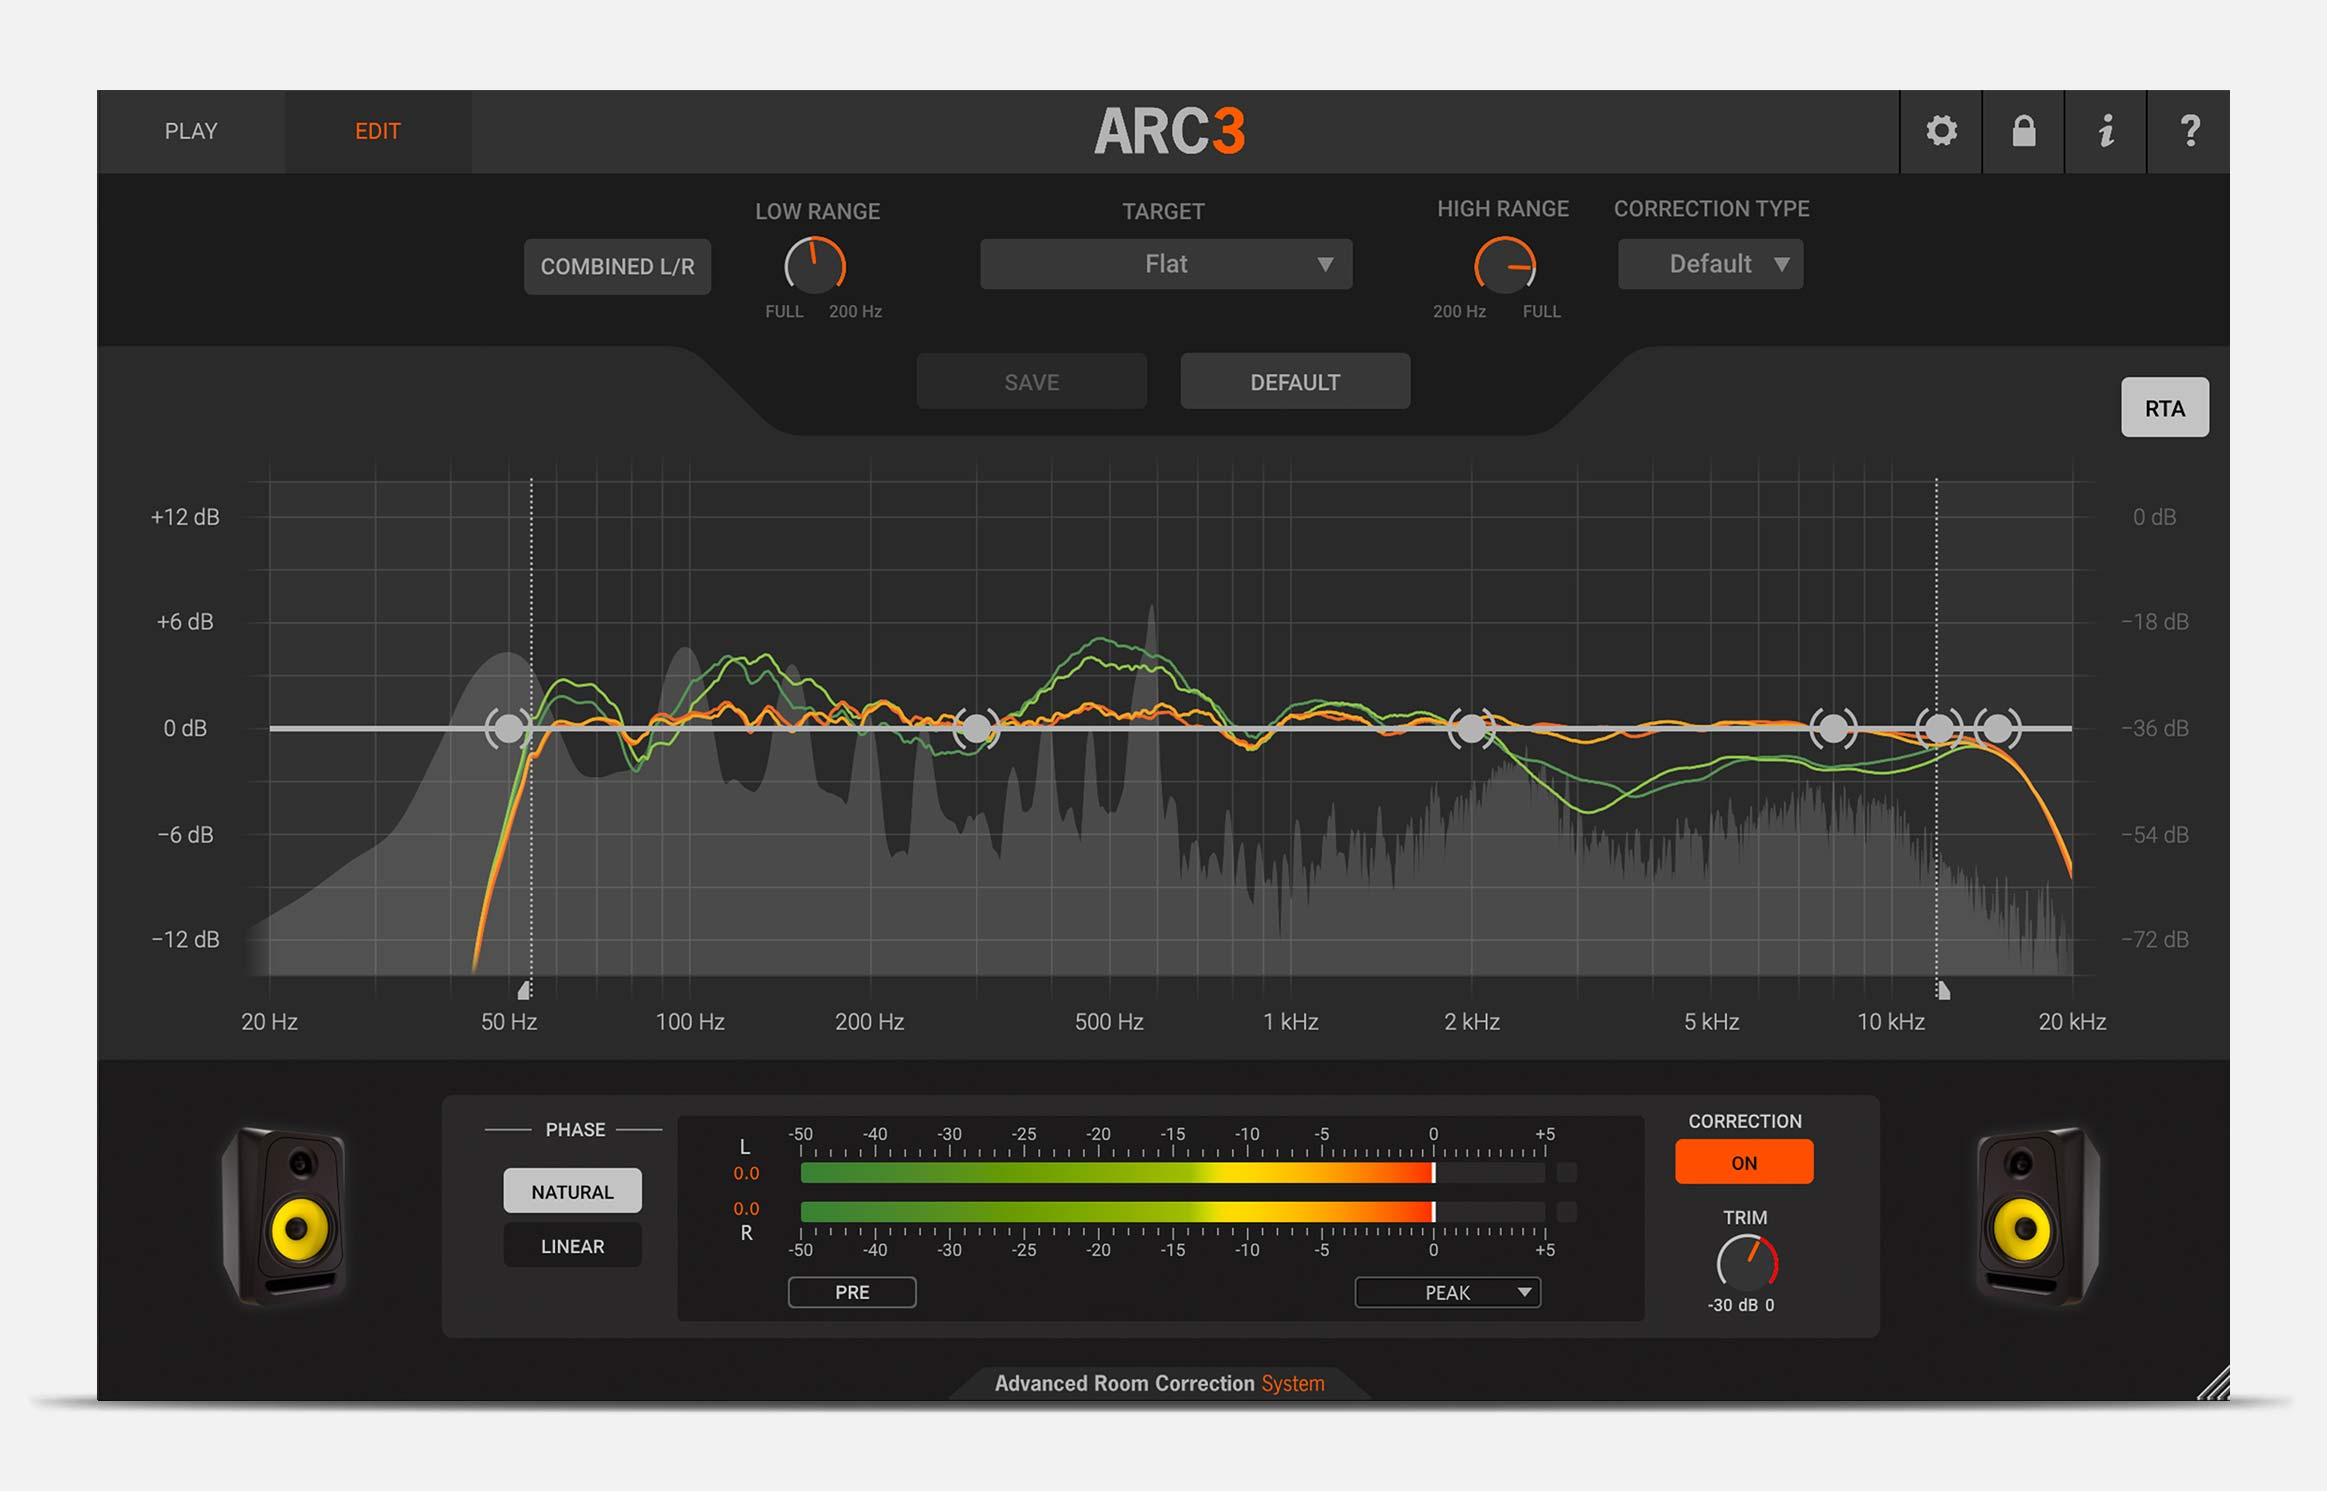 arc3_plugin_KRK_adjustable_correction_range_RTA_lgr@2x.jpg